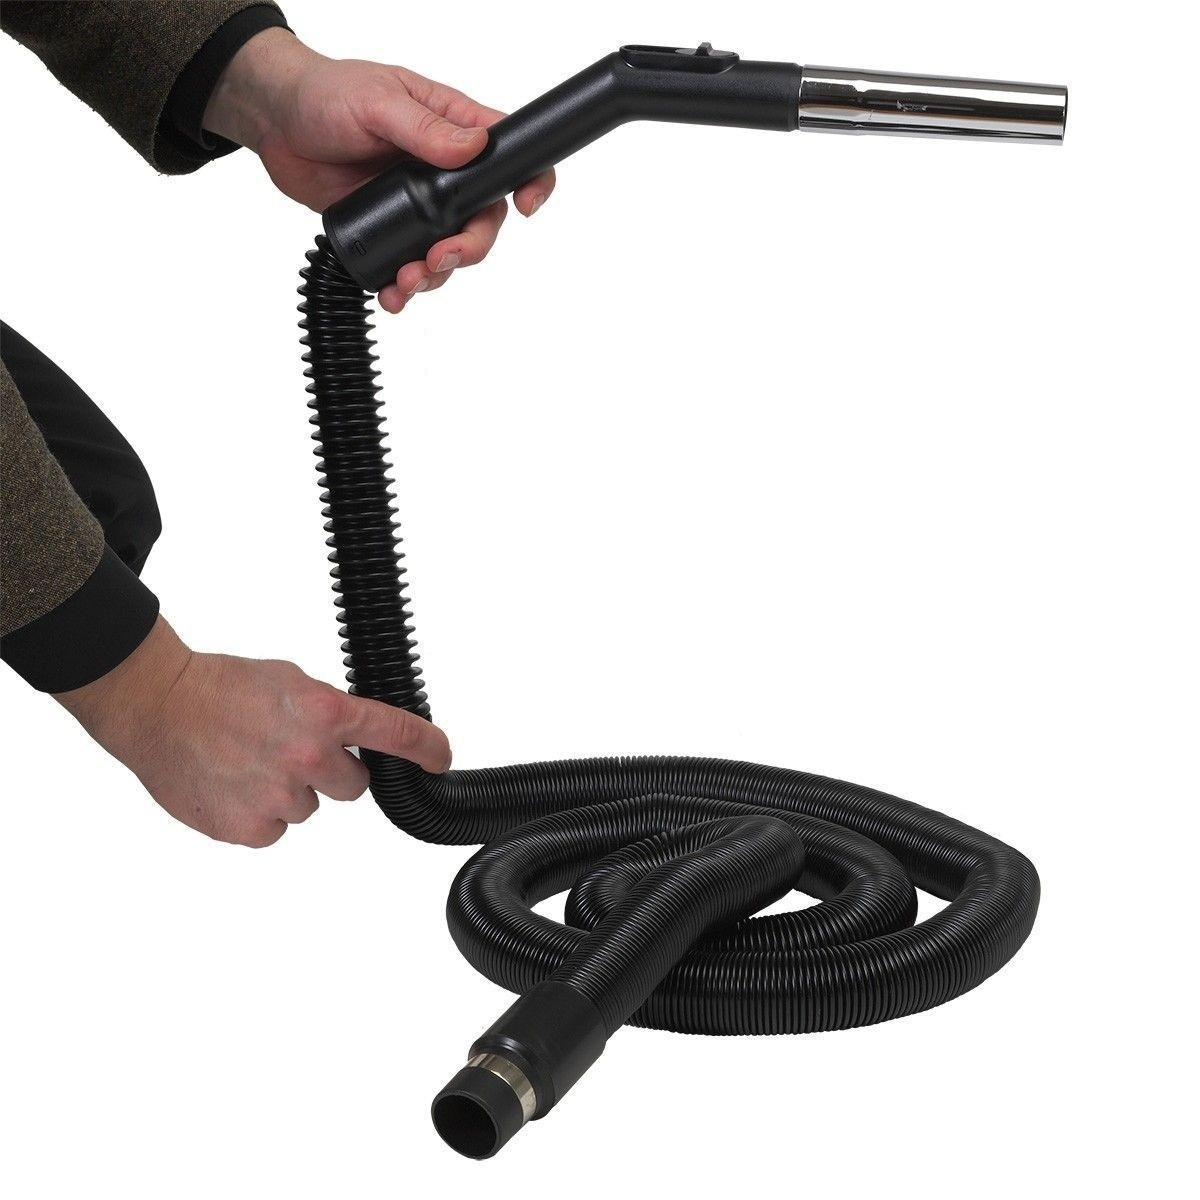 tuyau d aspiration centralise free tuyauterie flexible pour aspirateur central with tuyau d. Black Bedroom Furniture Sets. Home Design Ideas